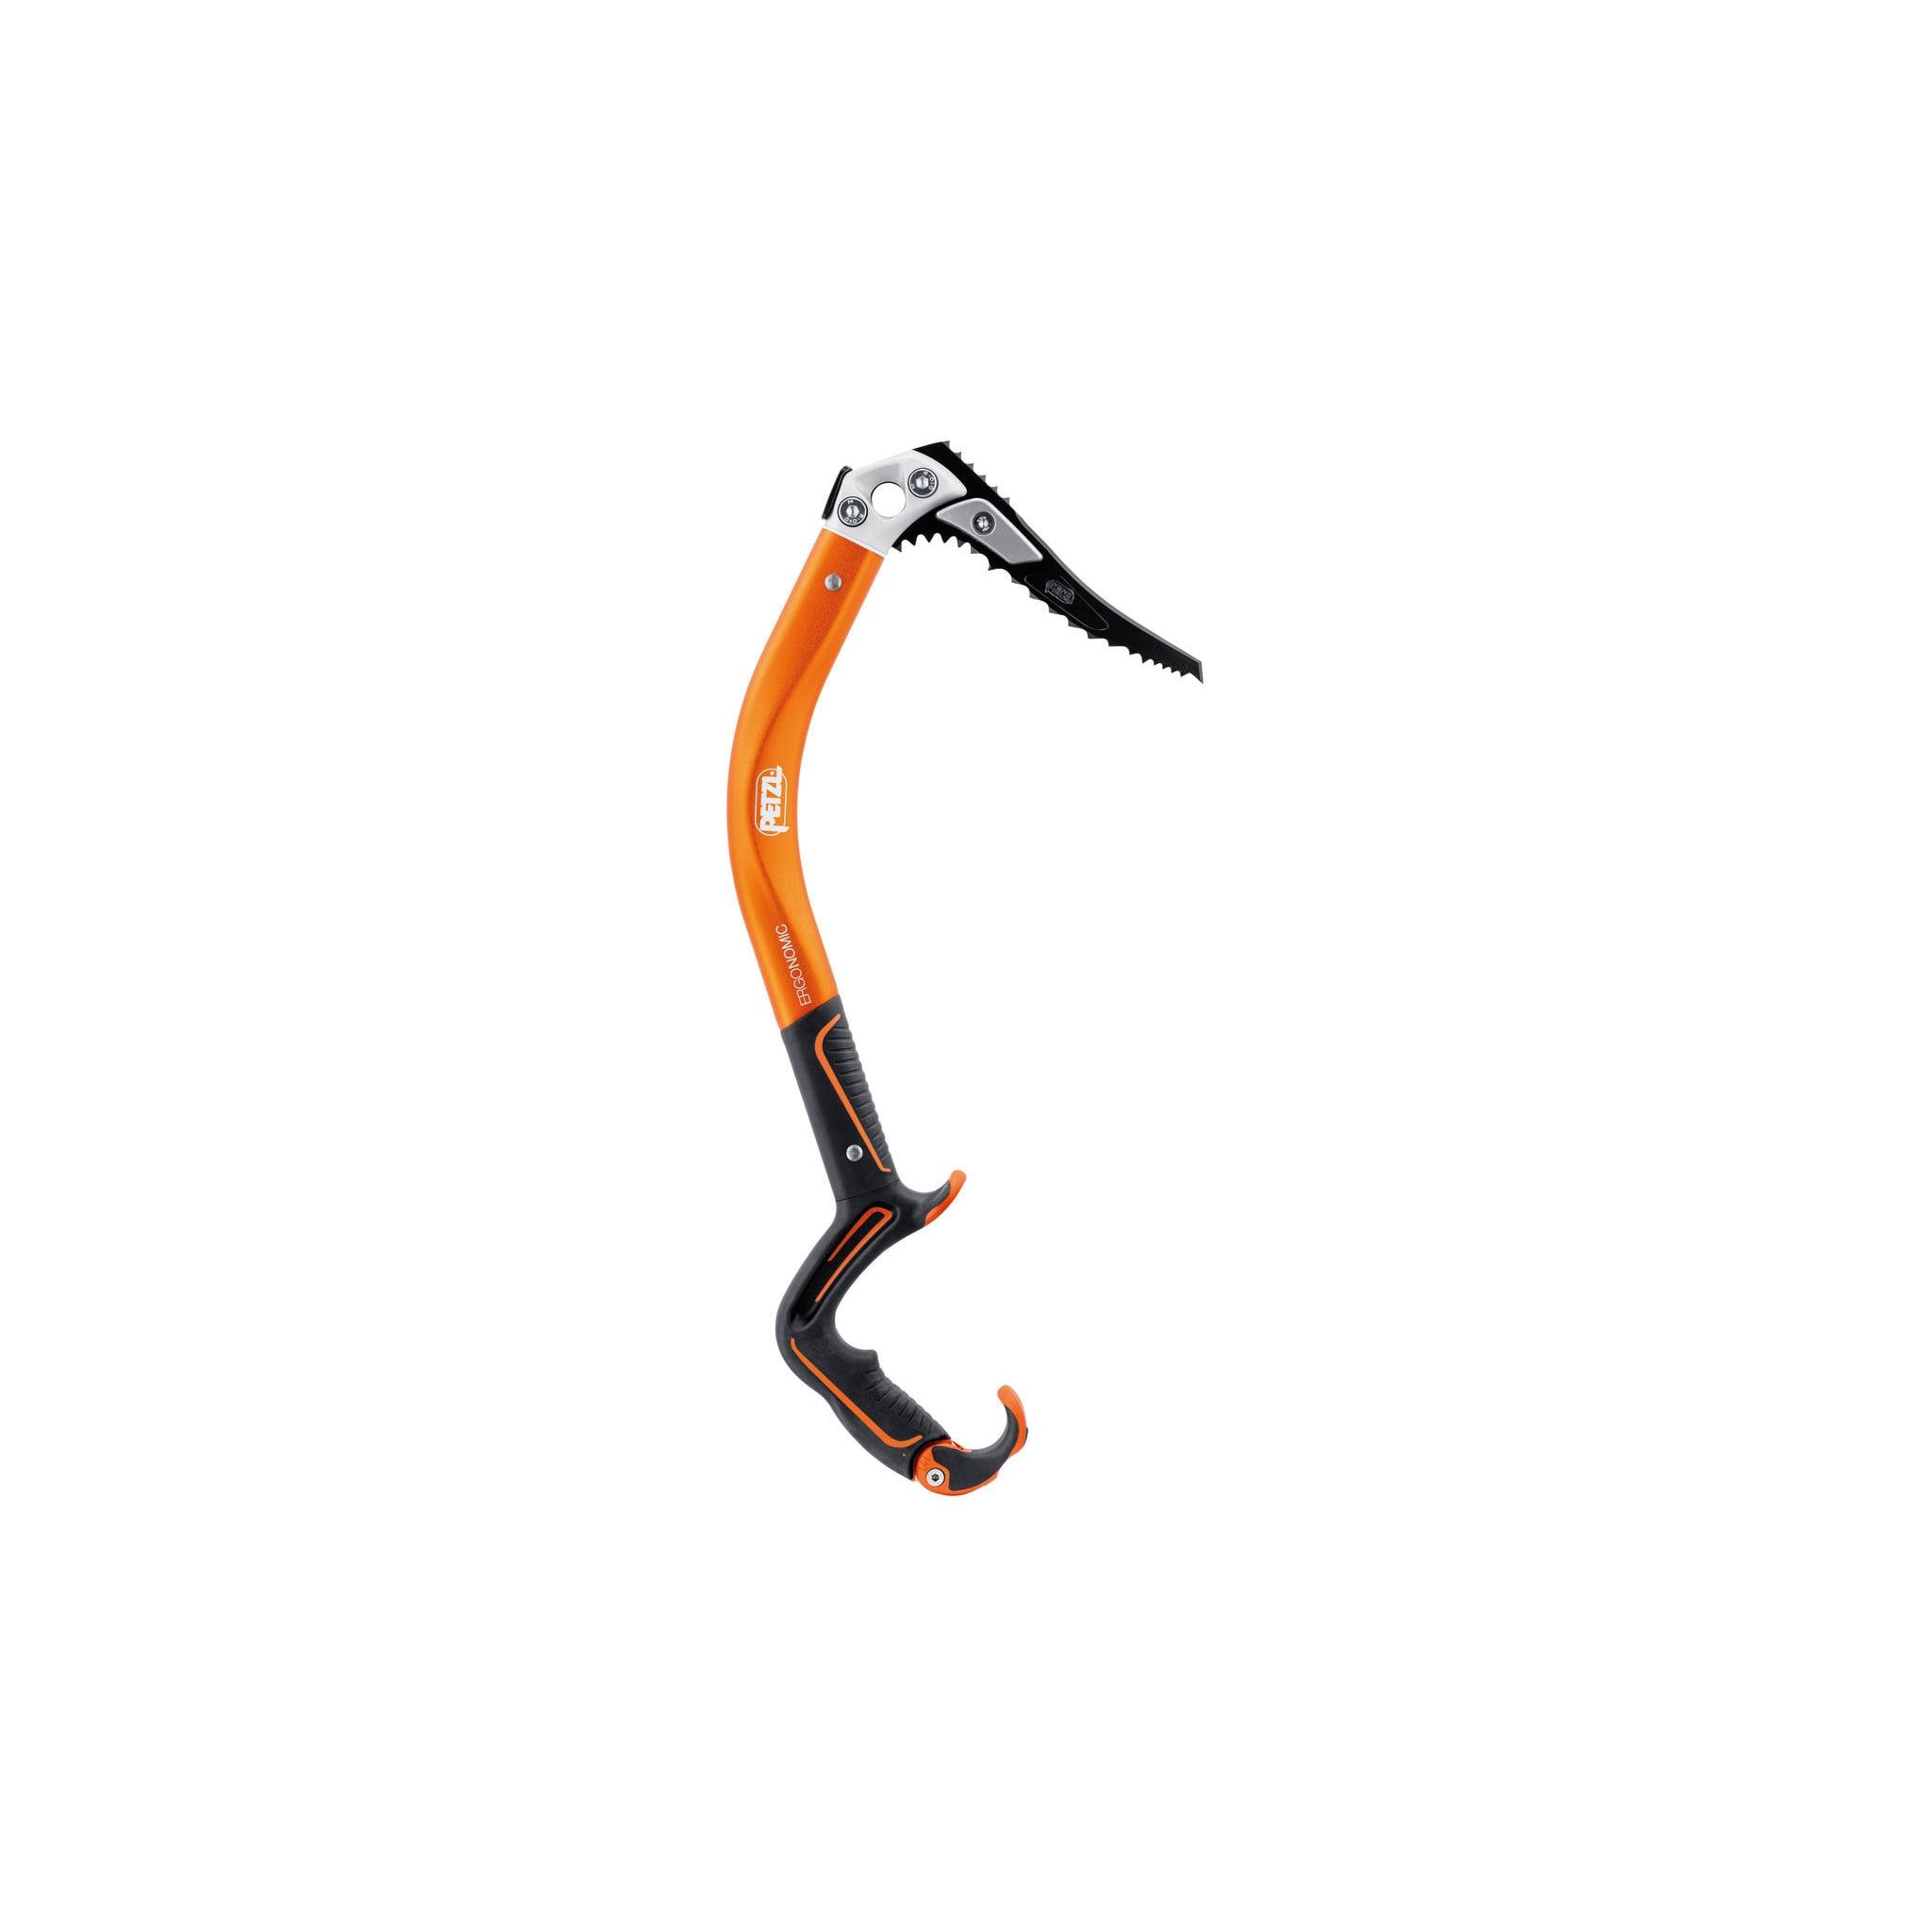 Aggressiv klatreøks til bratt og teknisk klatring